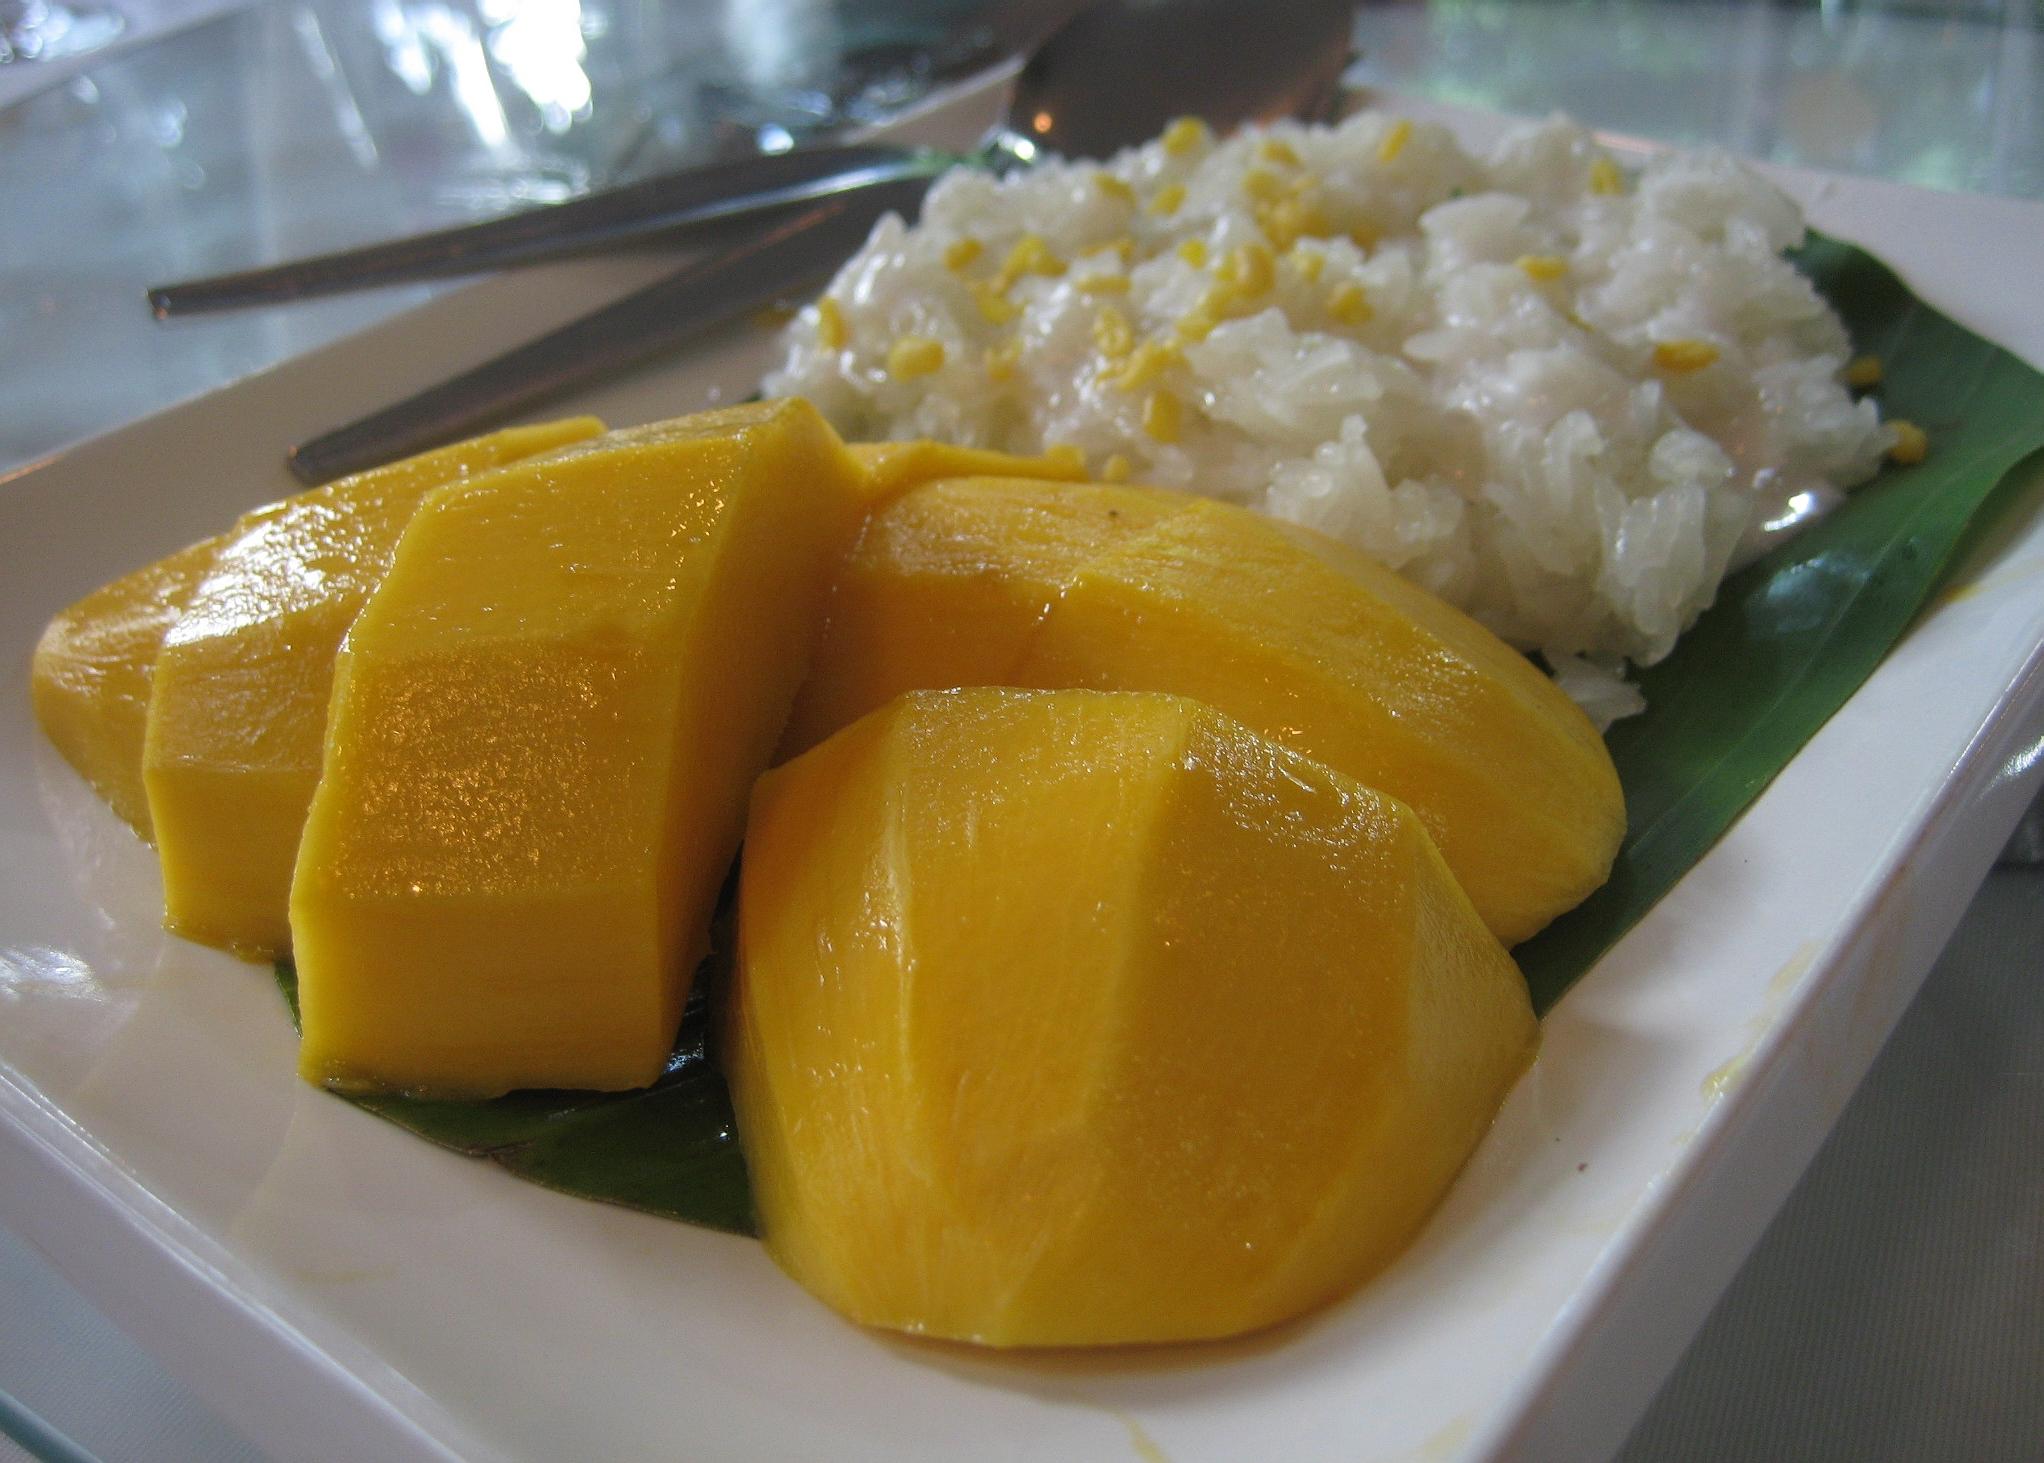 Mango_with_glutinous_rice